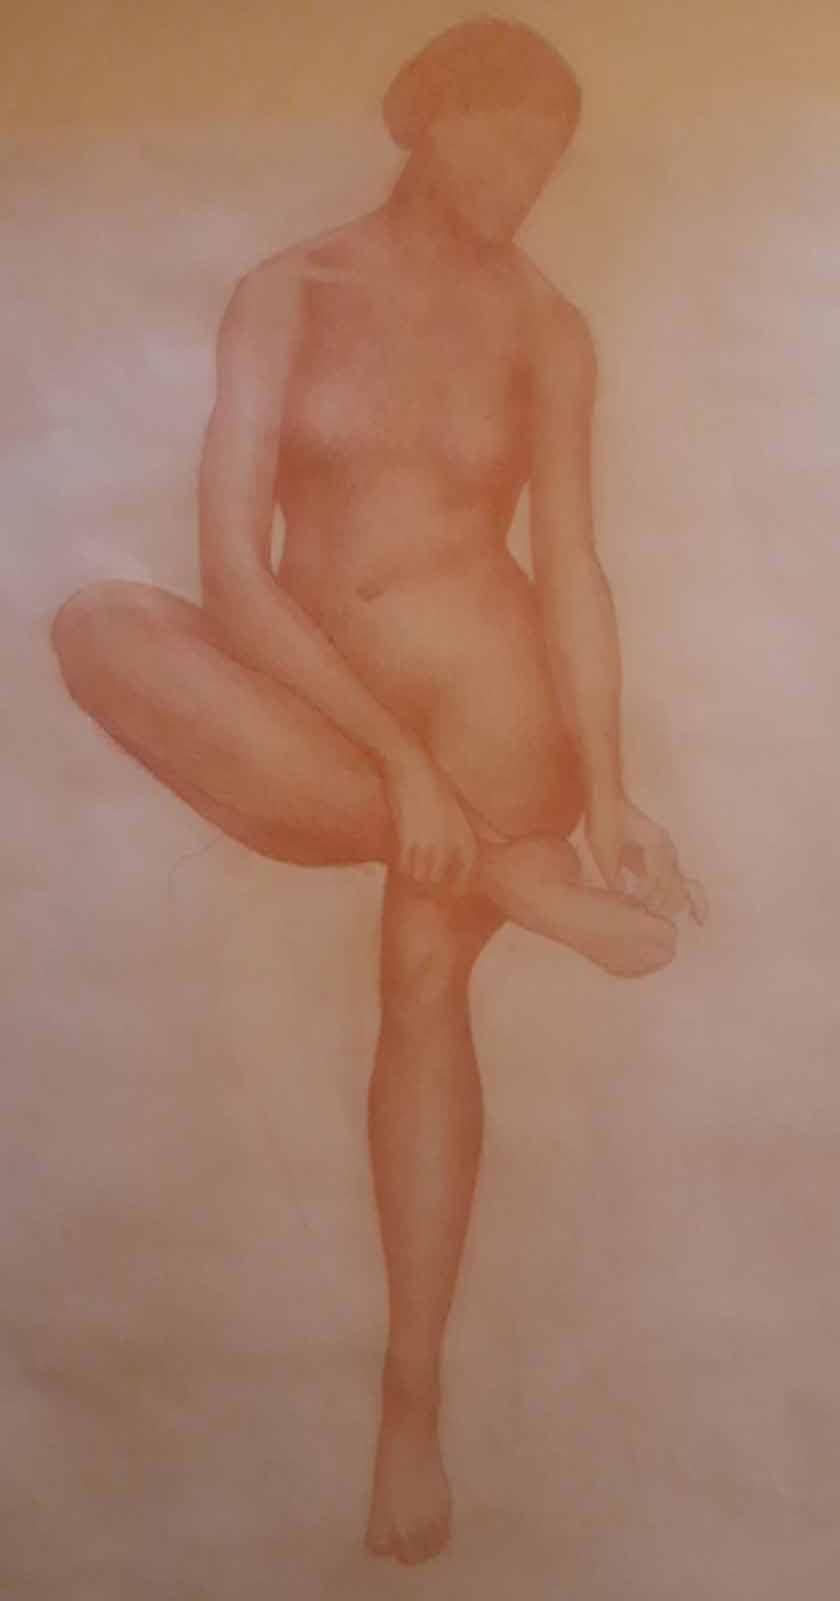 become a painter like Leonardo da Vinci